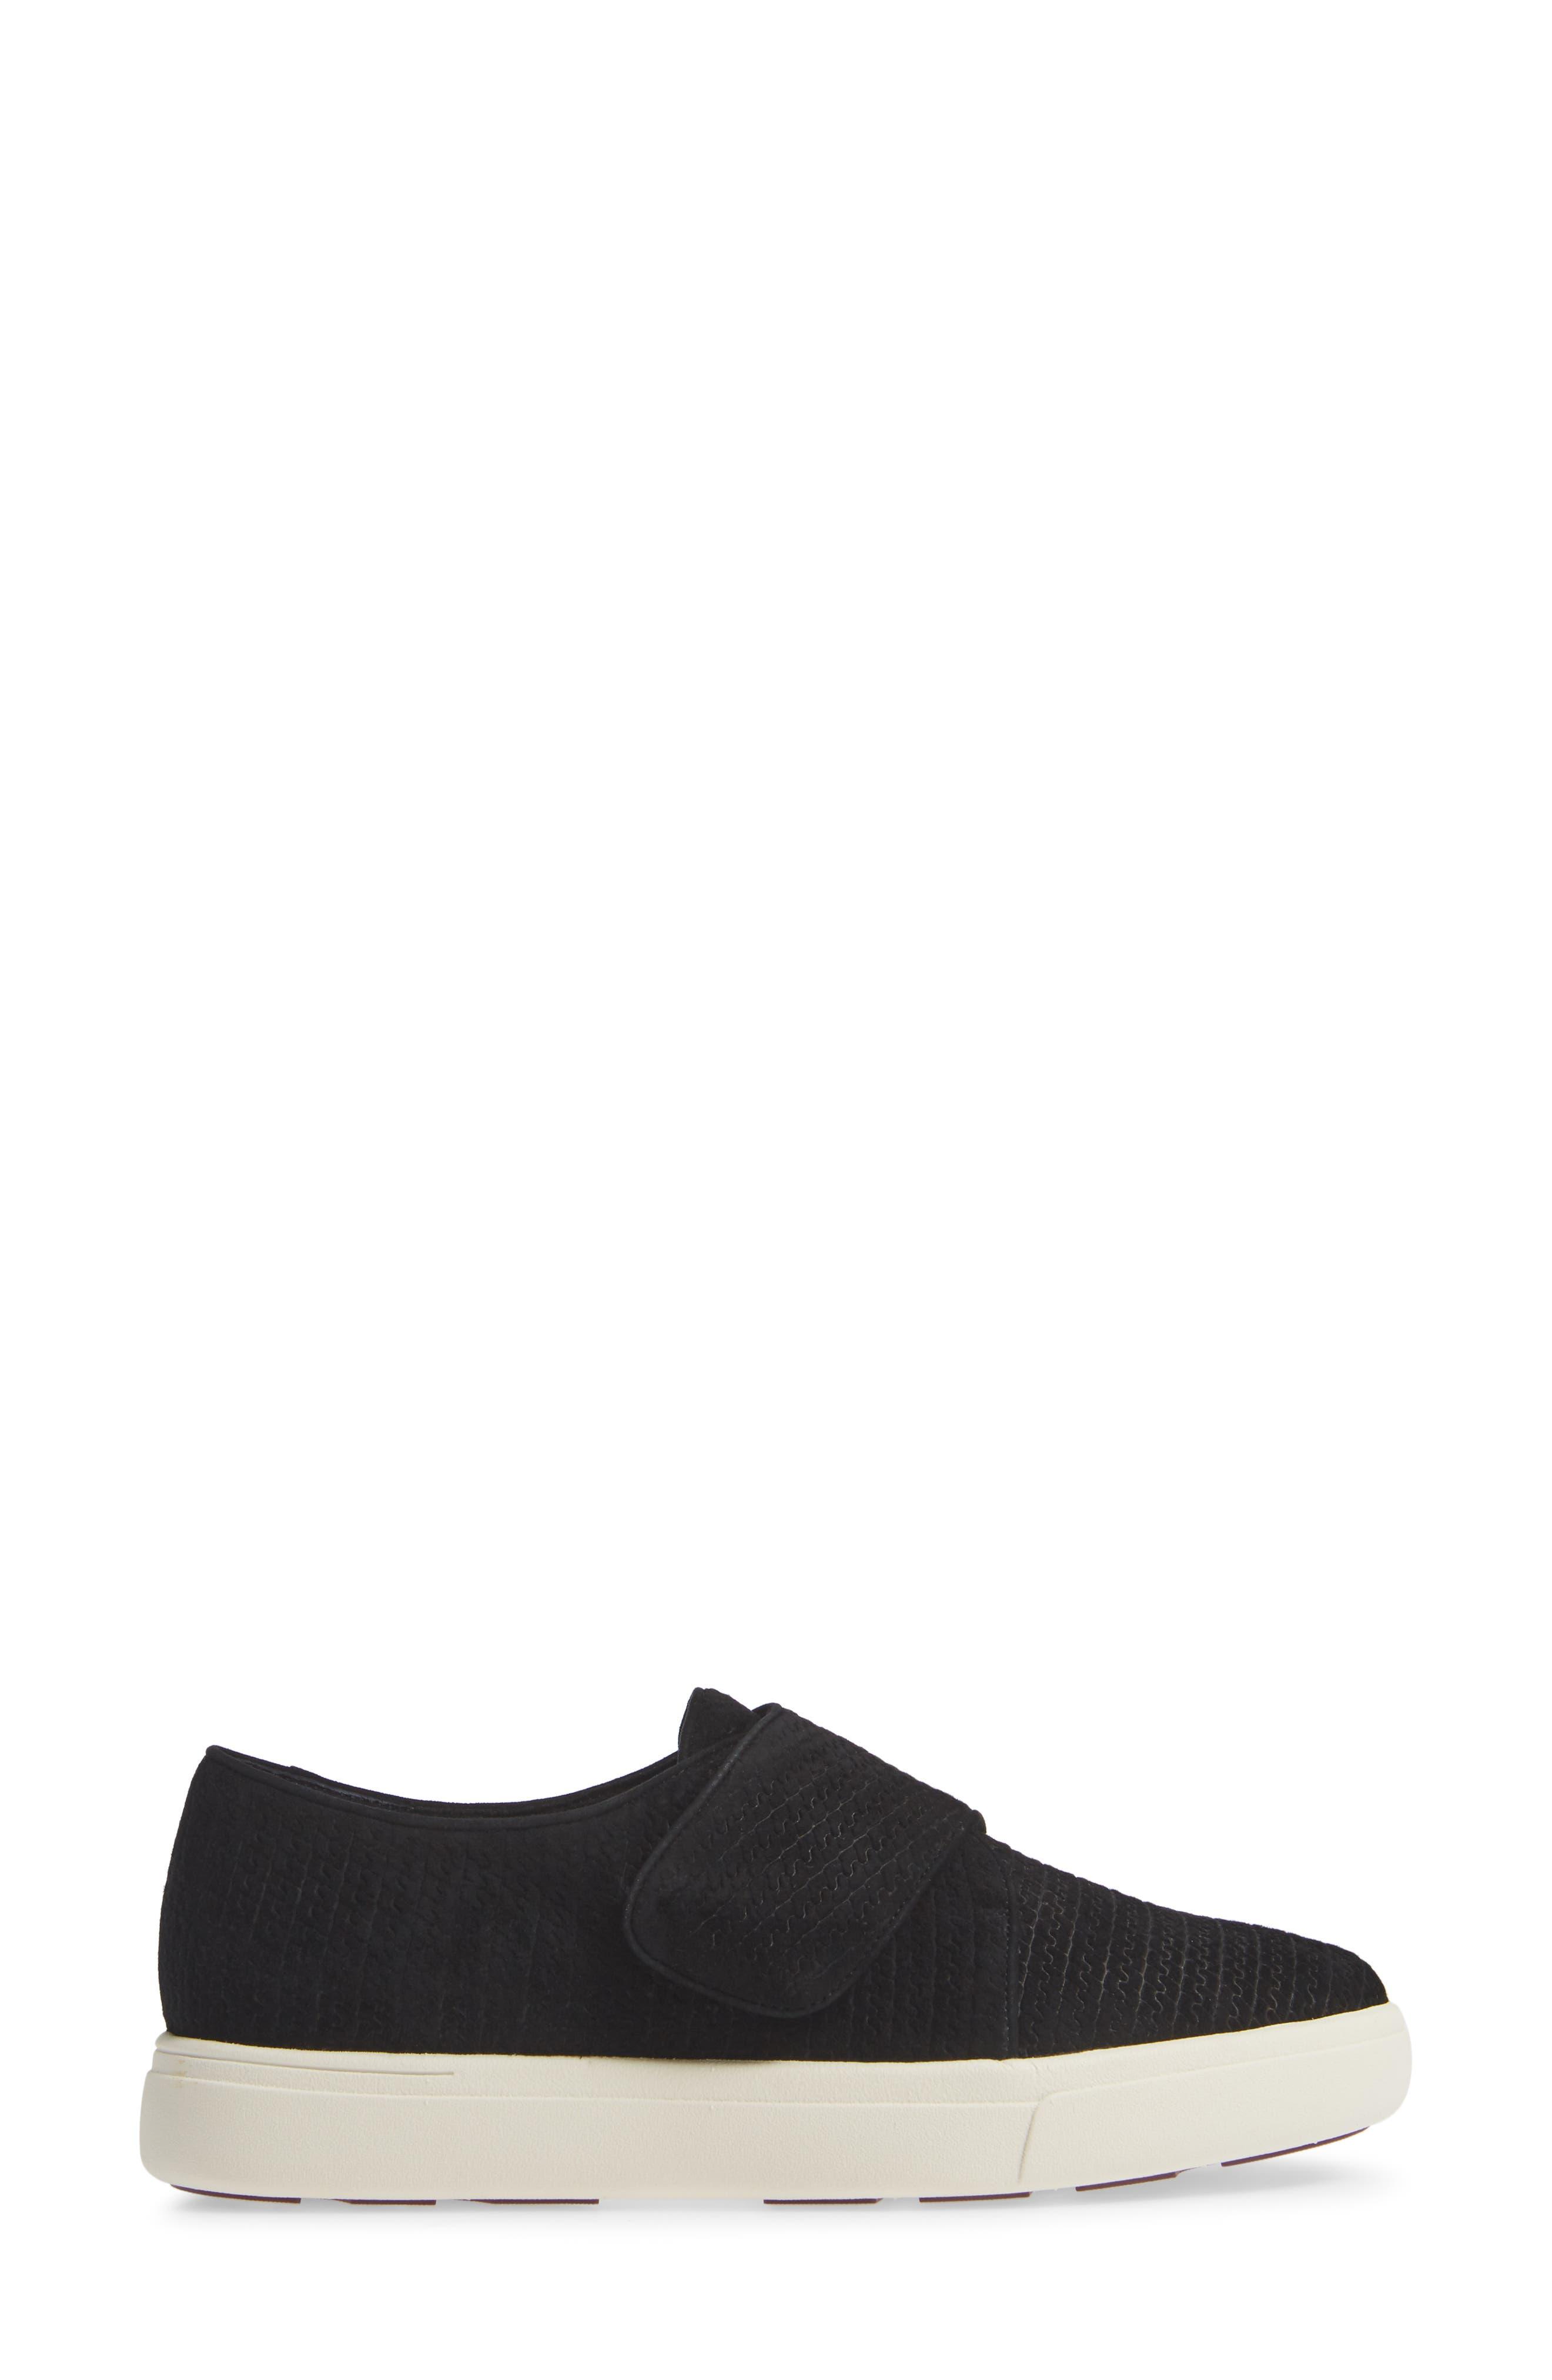 VANELI,                             Oberon Slip-On Sneaker,                             Alternate thumbnail 3, color,                             BLACK SUEDE